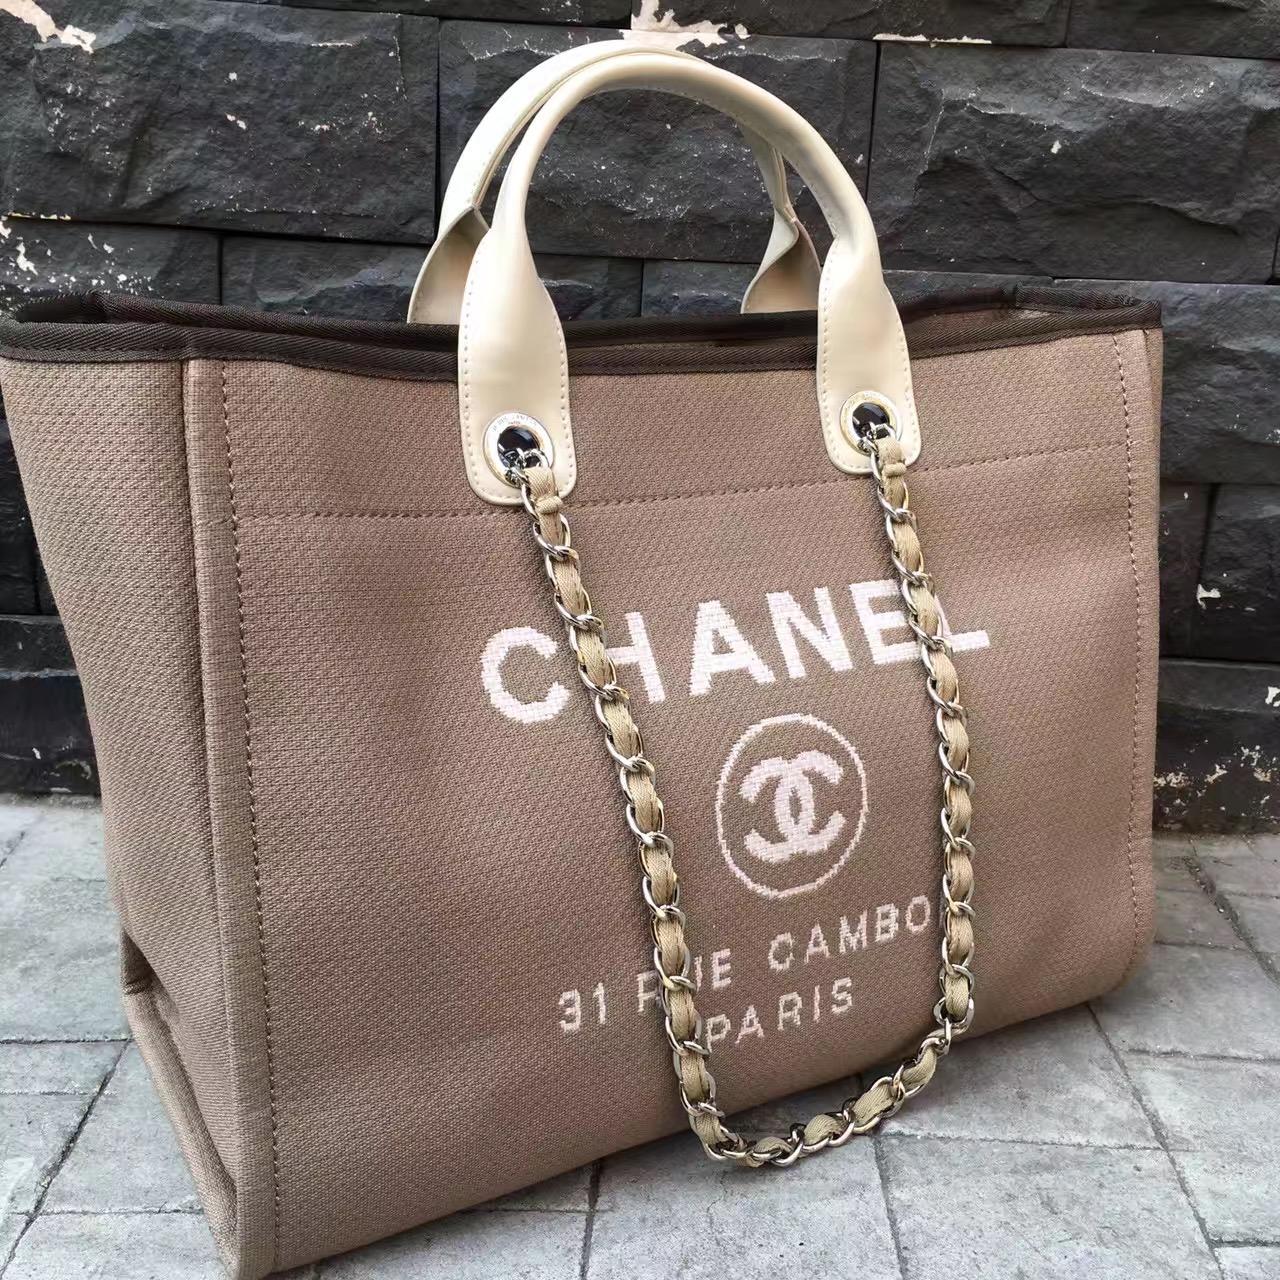 531909e3e7f3 Chanel Handbag on Storenvy